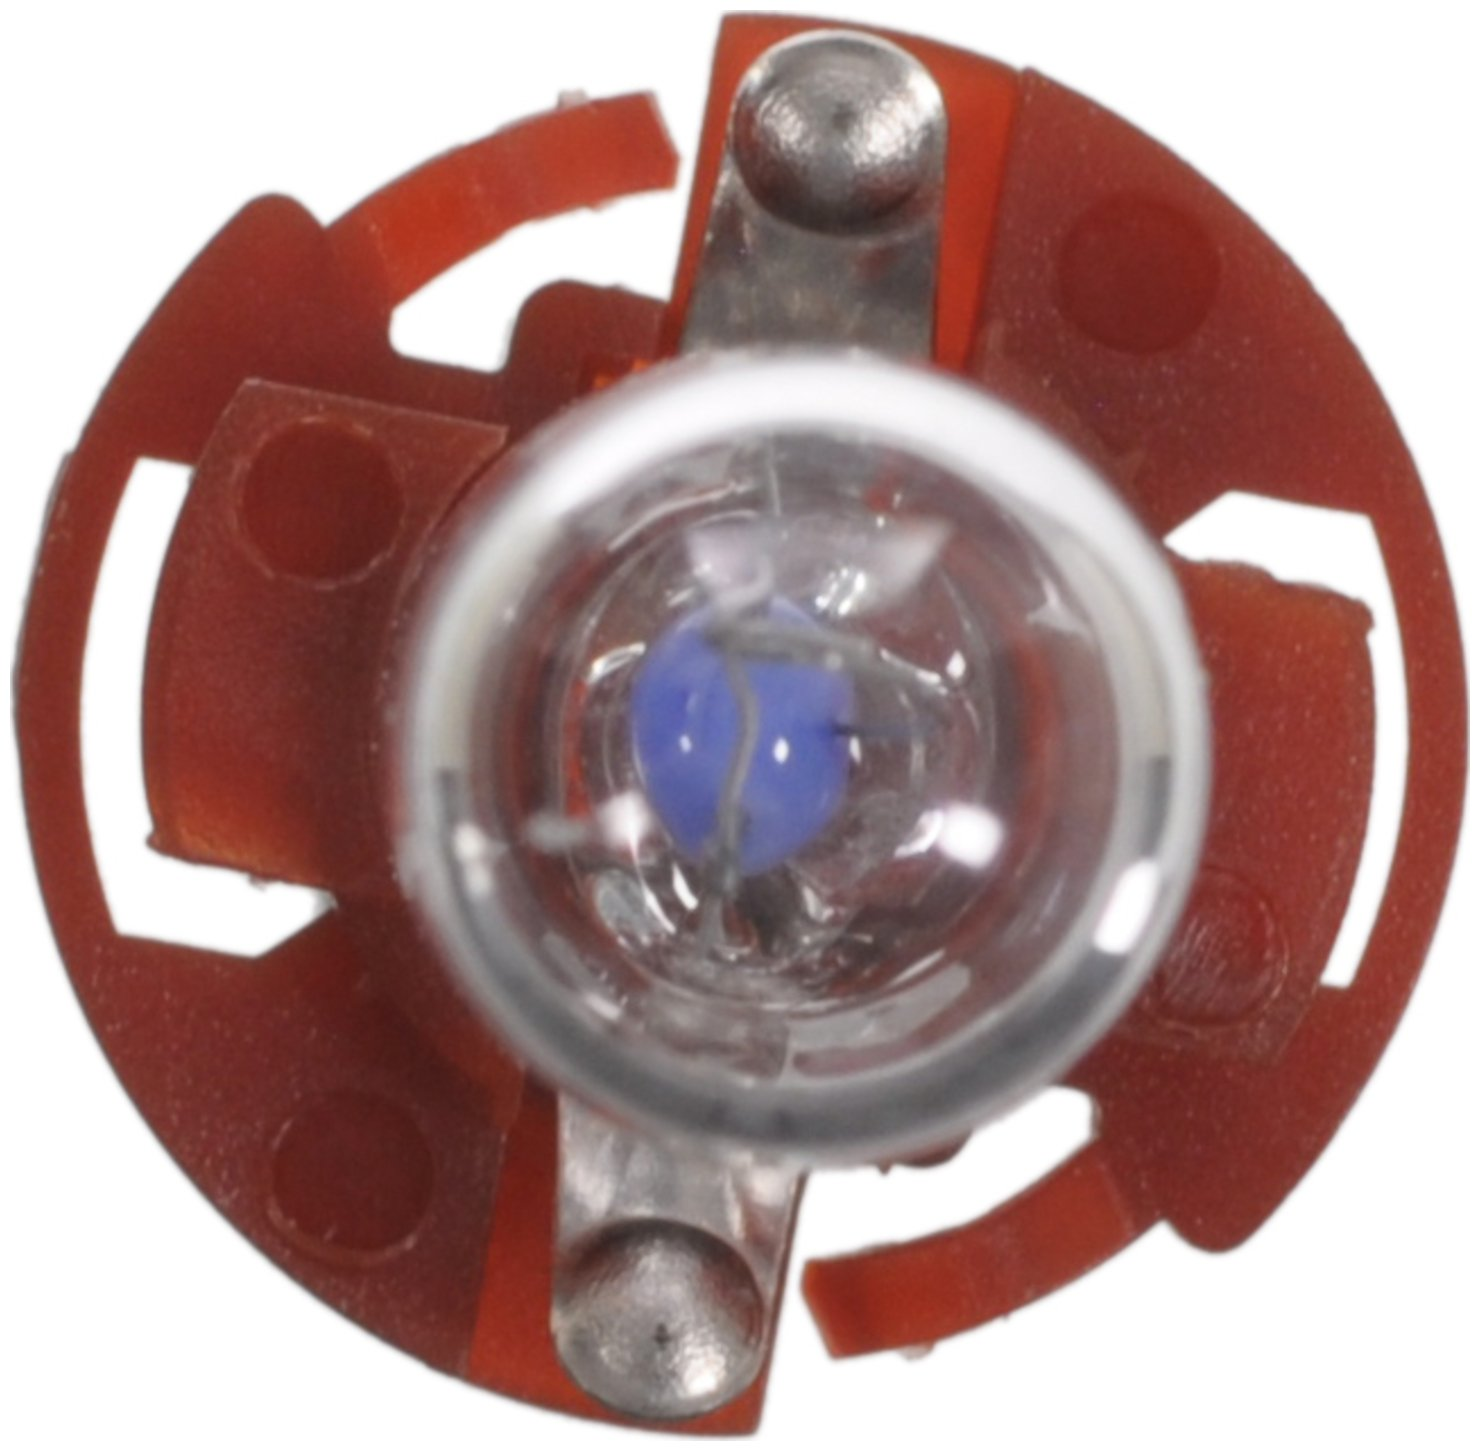 Card of 2 Wagner Lighting BPPC118 Miniature Bulb